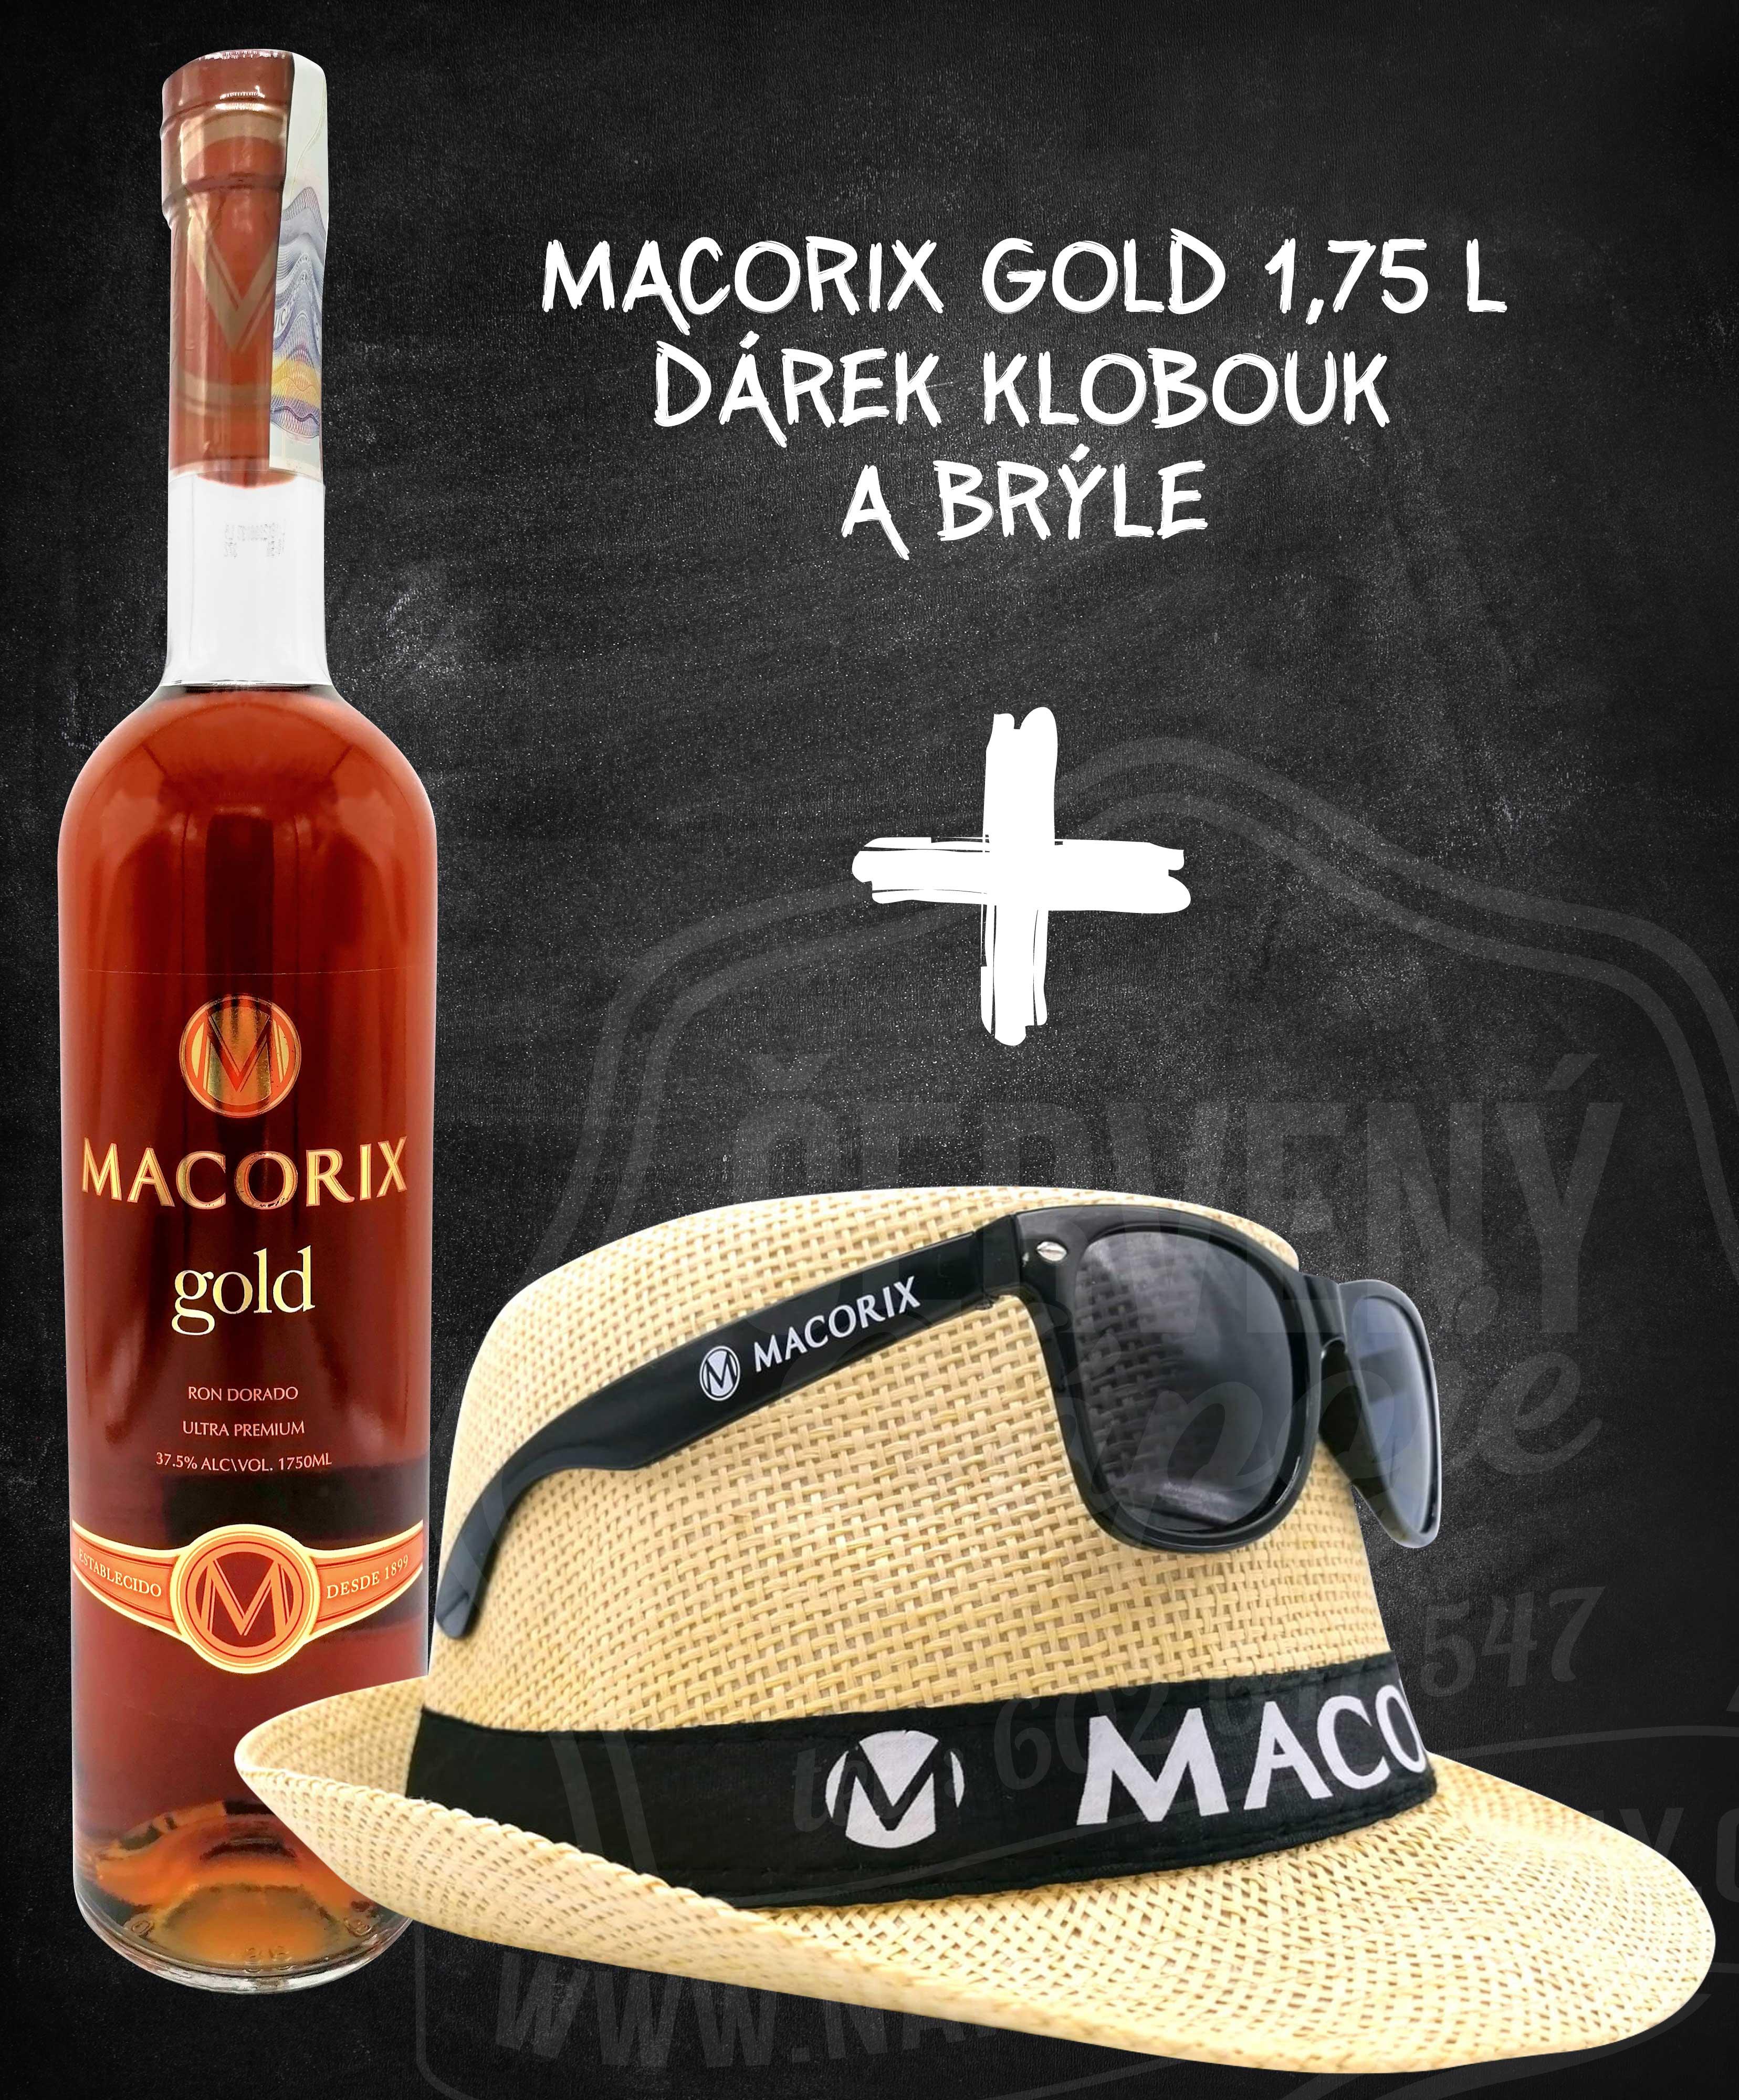 Macorix Gold